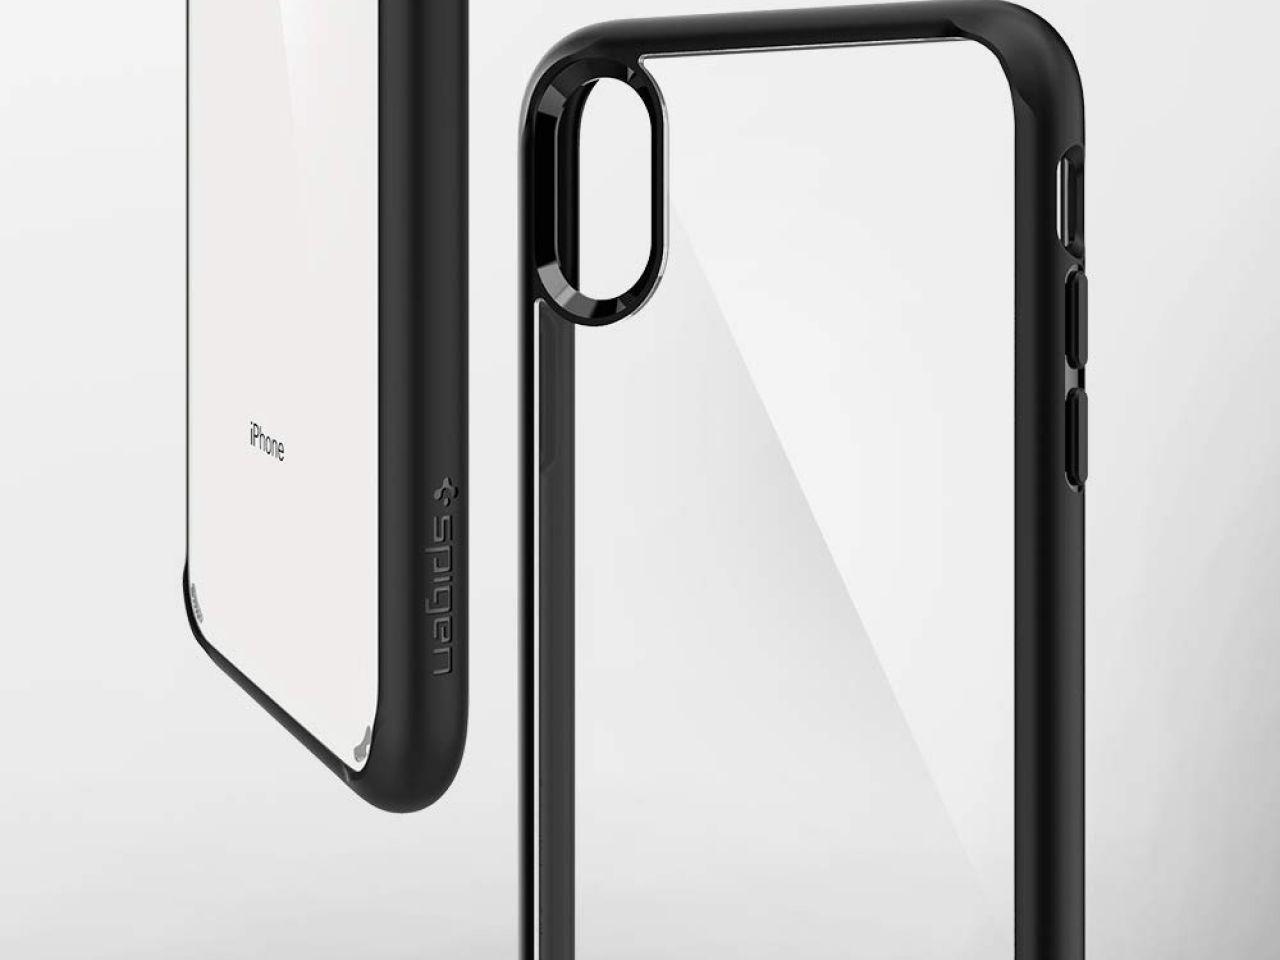 Le cinque migliori cover per iPhone XS ed iPhone XS Max in ...